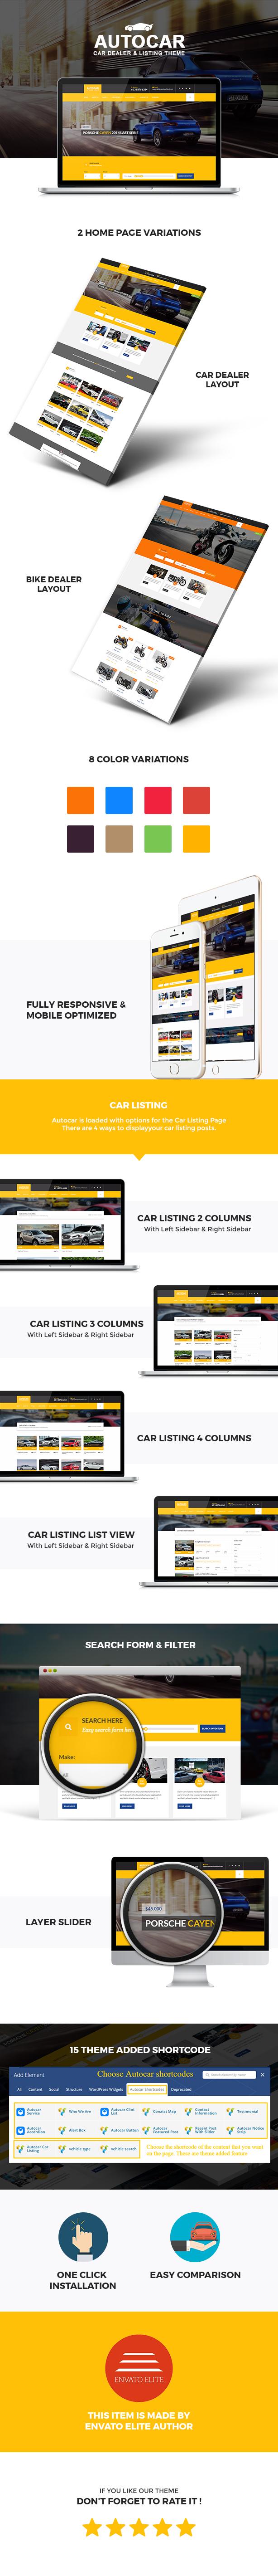 Car Dealer WordPress Theme  - Auto Car - 1